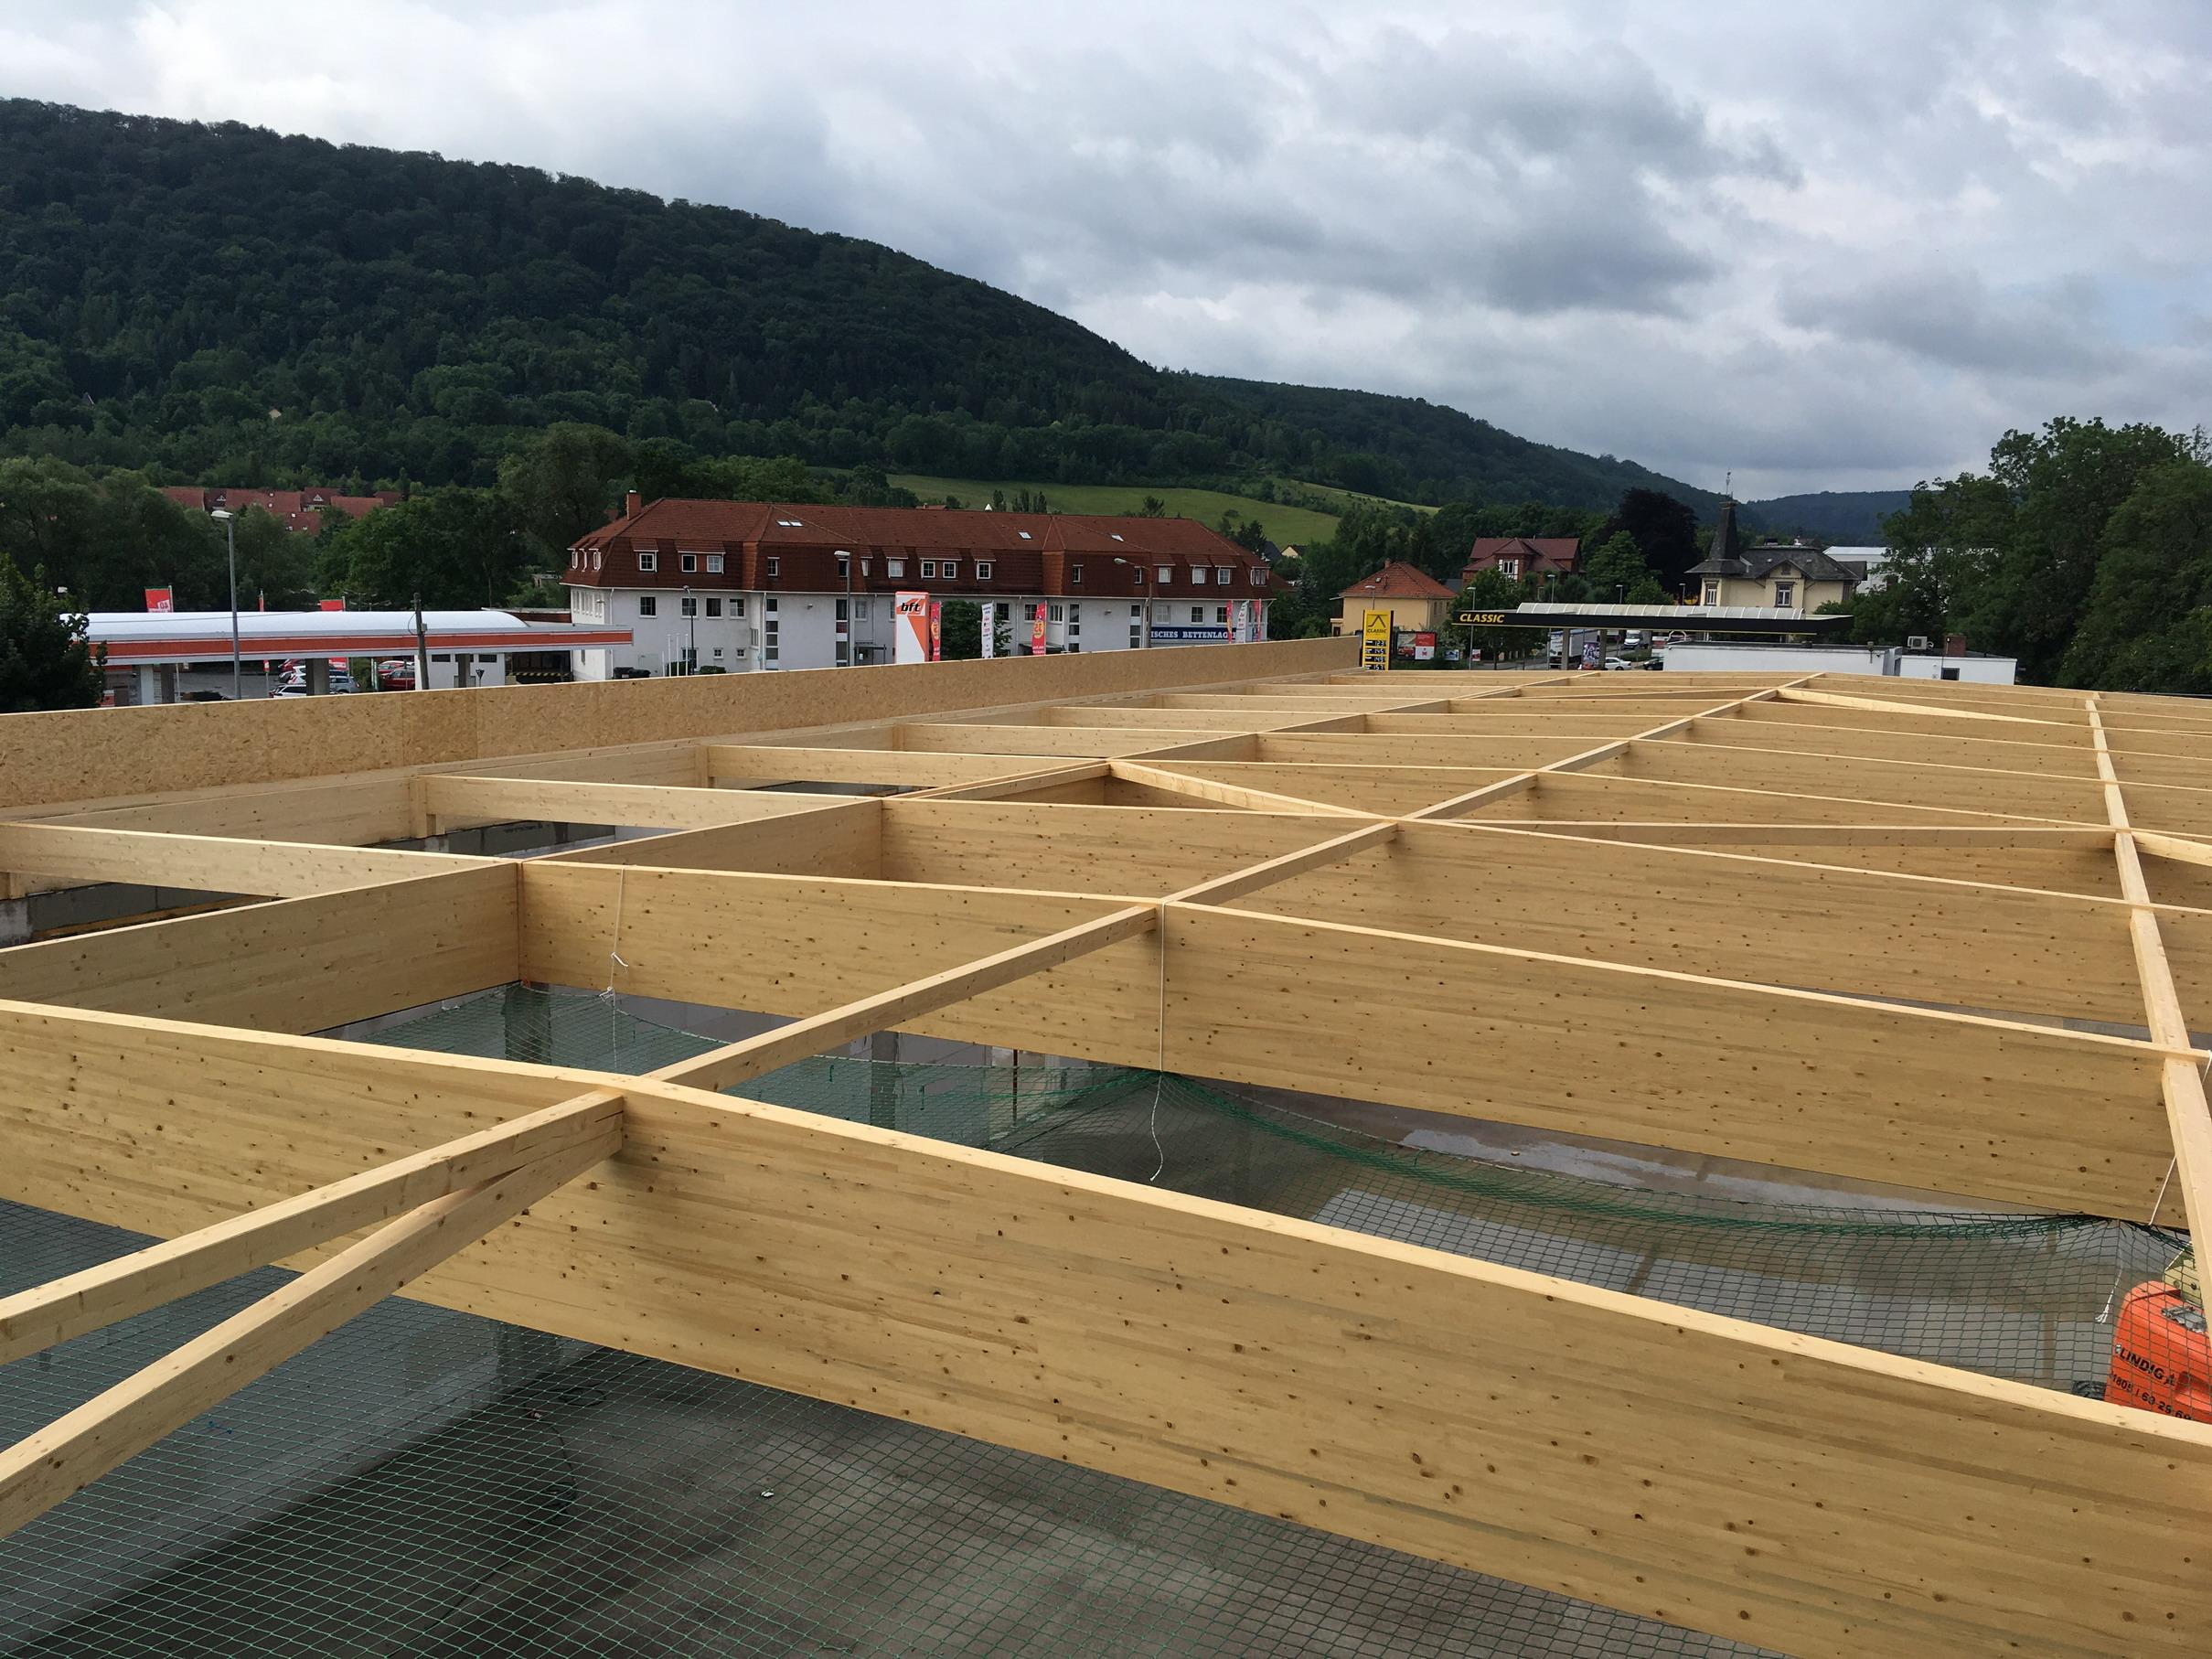 Satteldachbinder Lebensmittelmarkt Verbrauchermarkt Leimholz Dachkonstruktion Holzrahmenbauwand